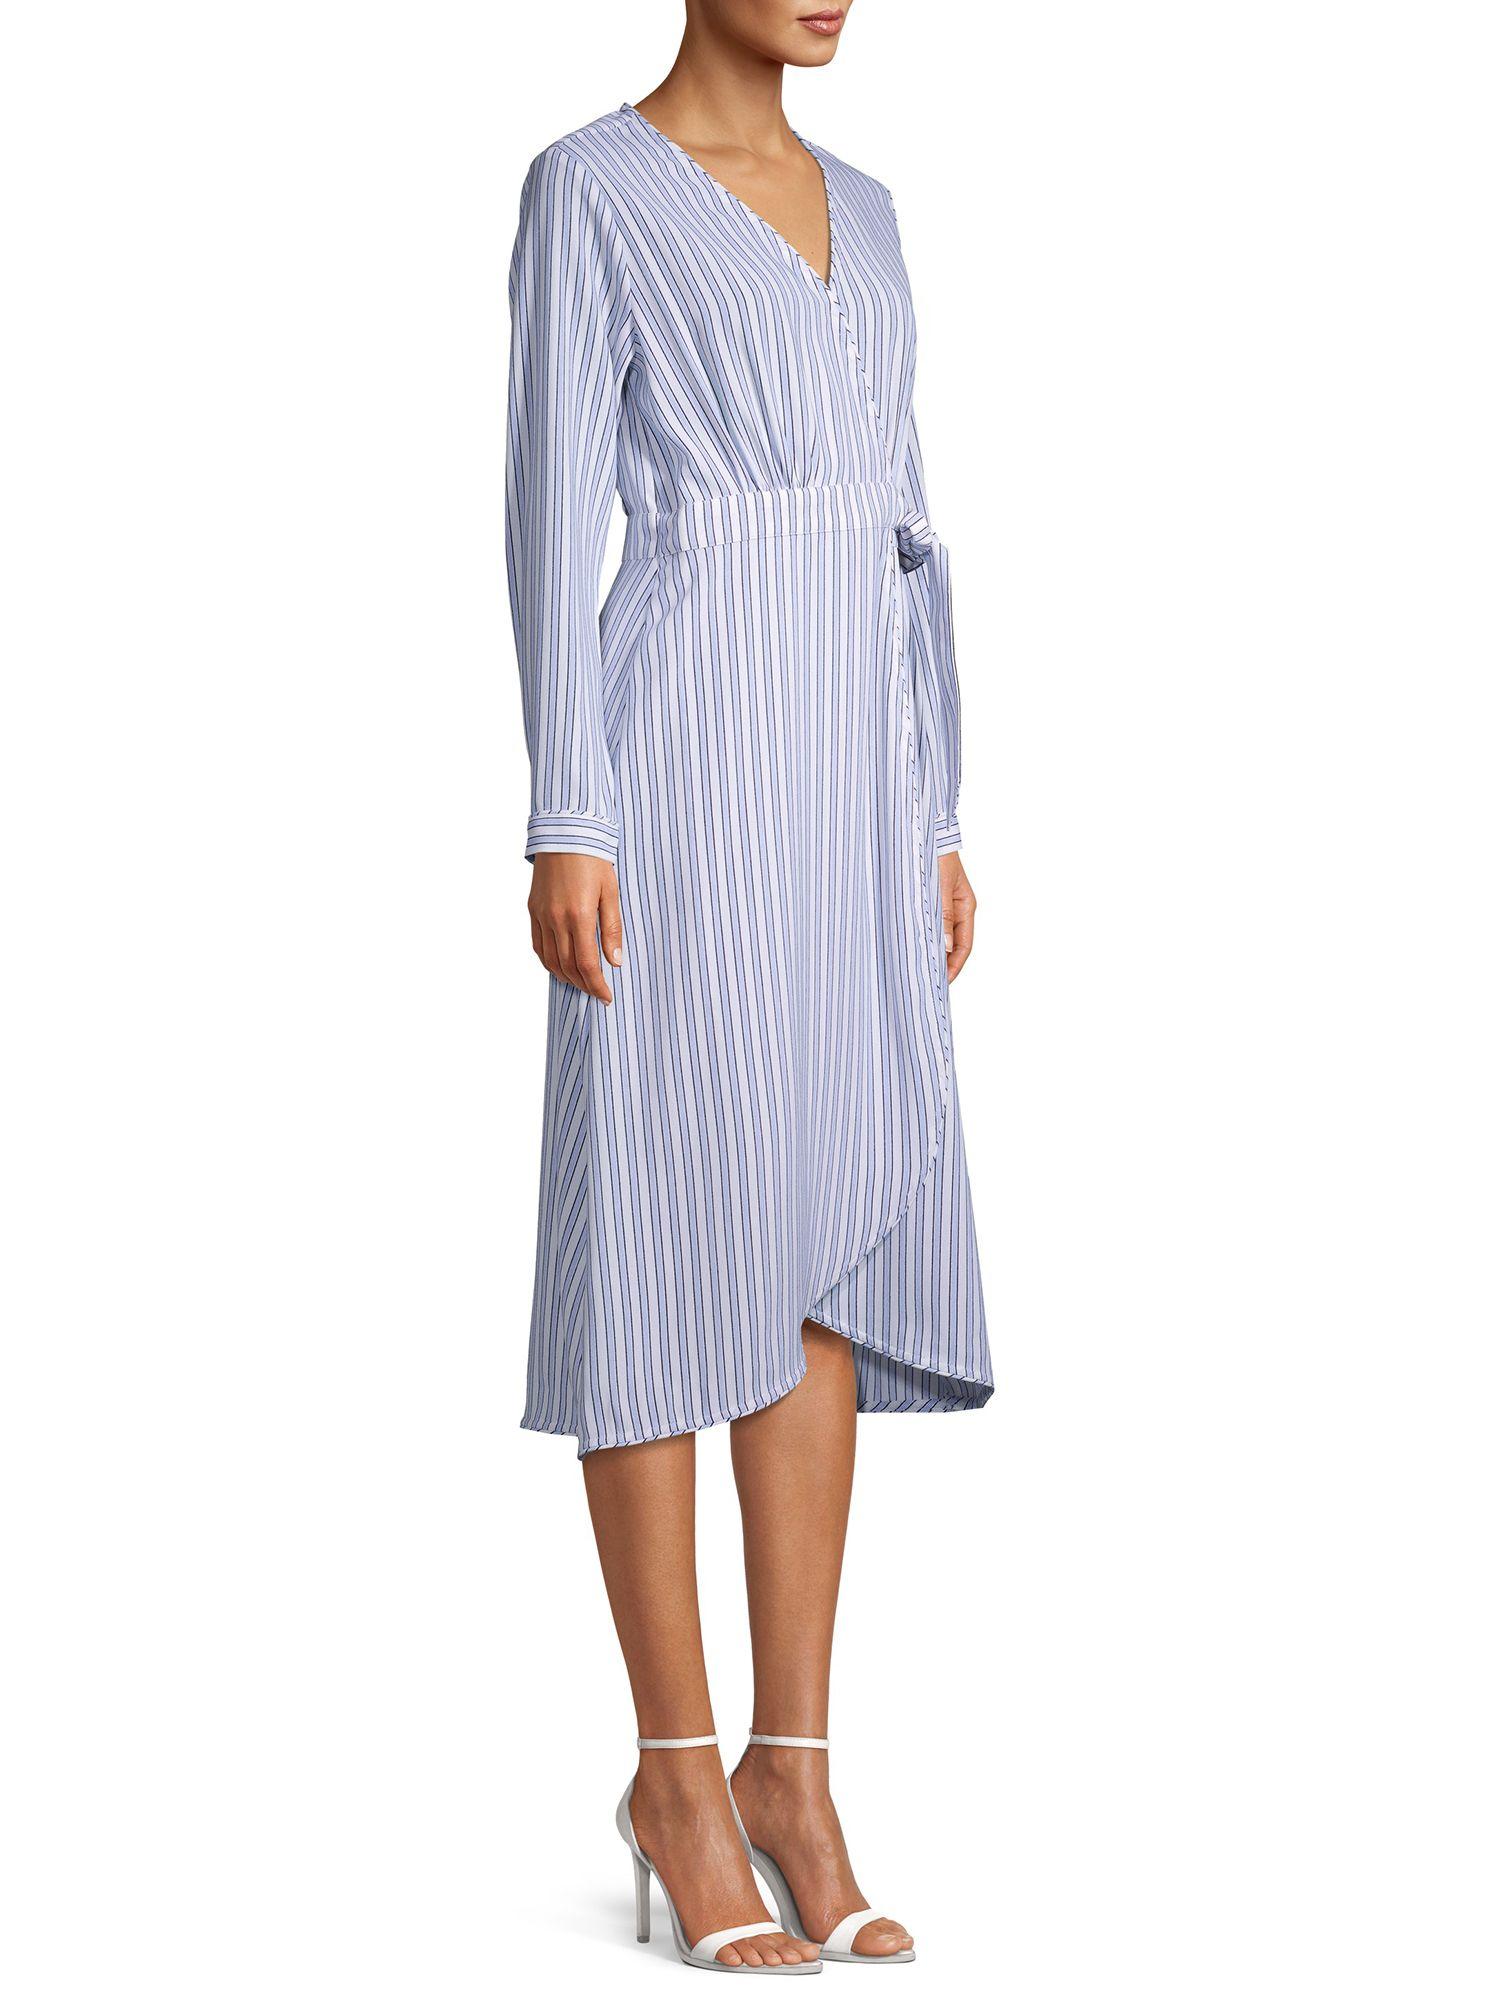 Time And Tru Time And Tru Women S Long Sleeve Faux Wrap Dress Walmart Com Wrap Dress Women Long Sleeve Faux Wrap Dress [ 2000 x 1500 Pixel ]